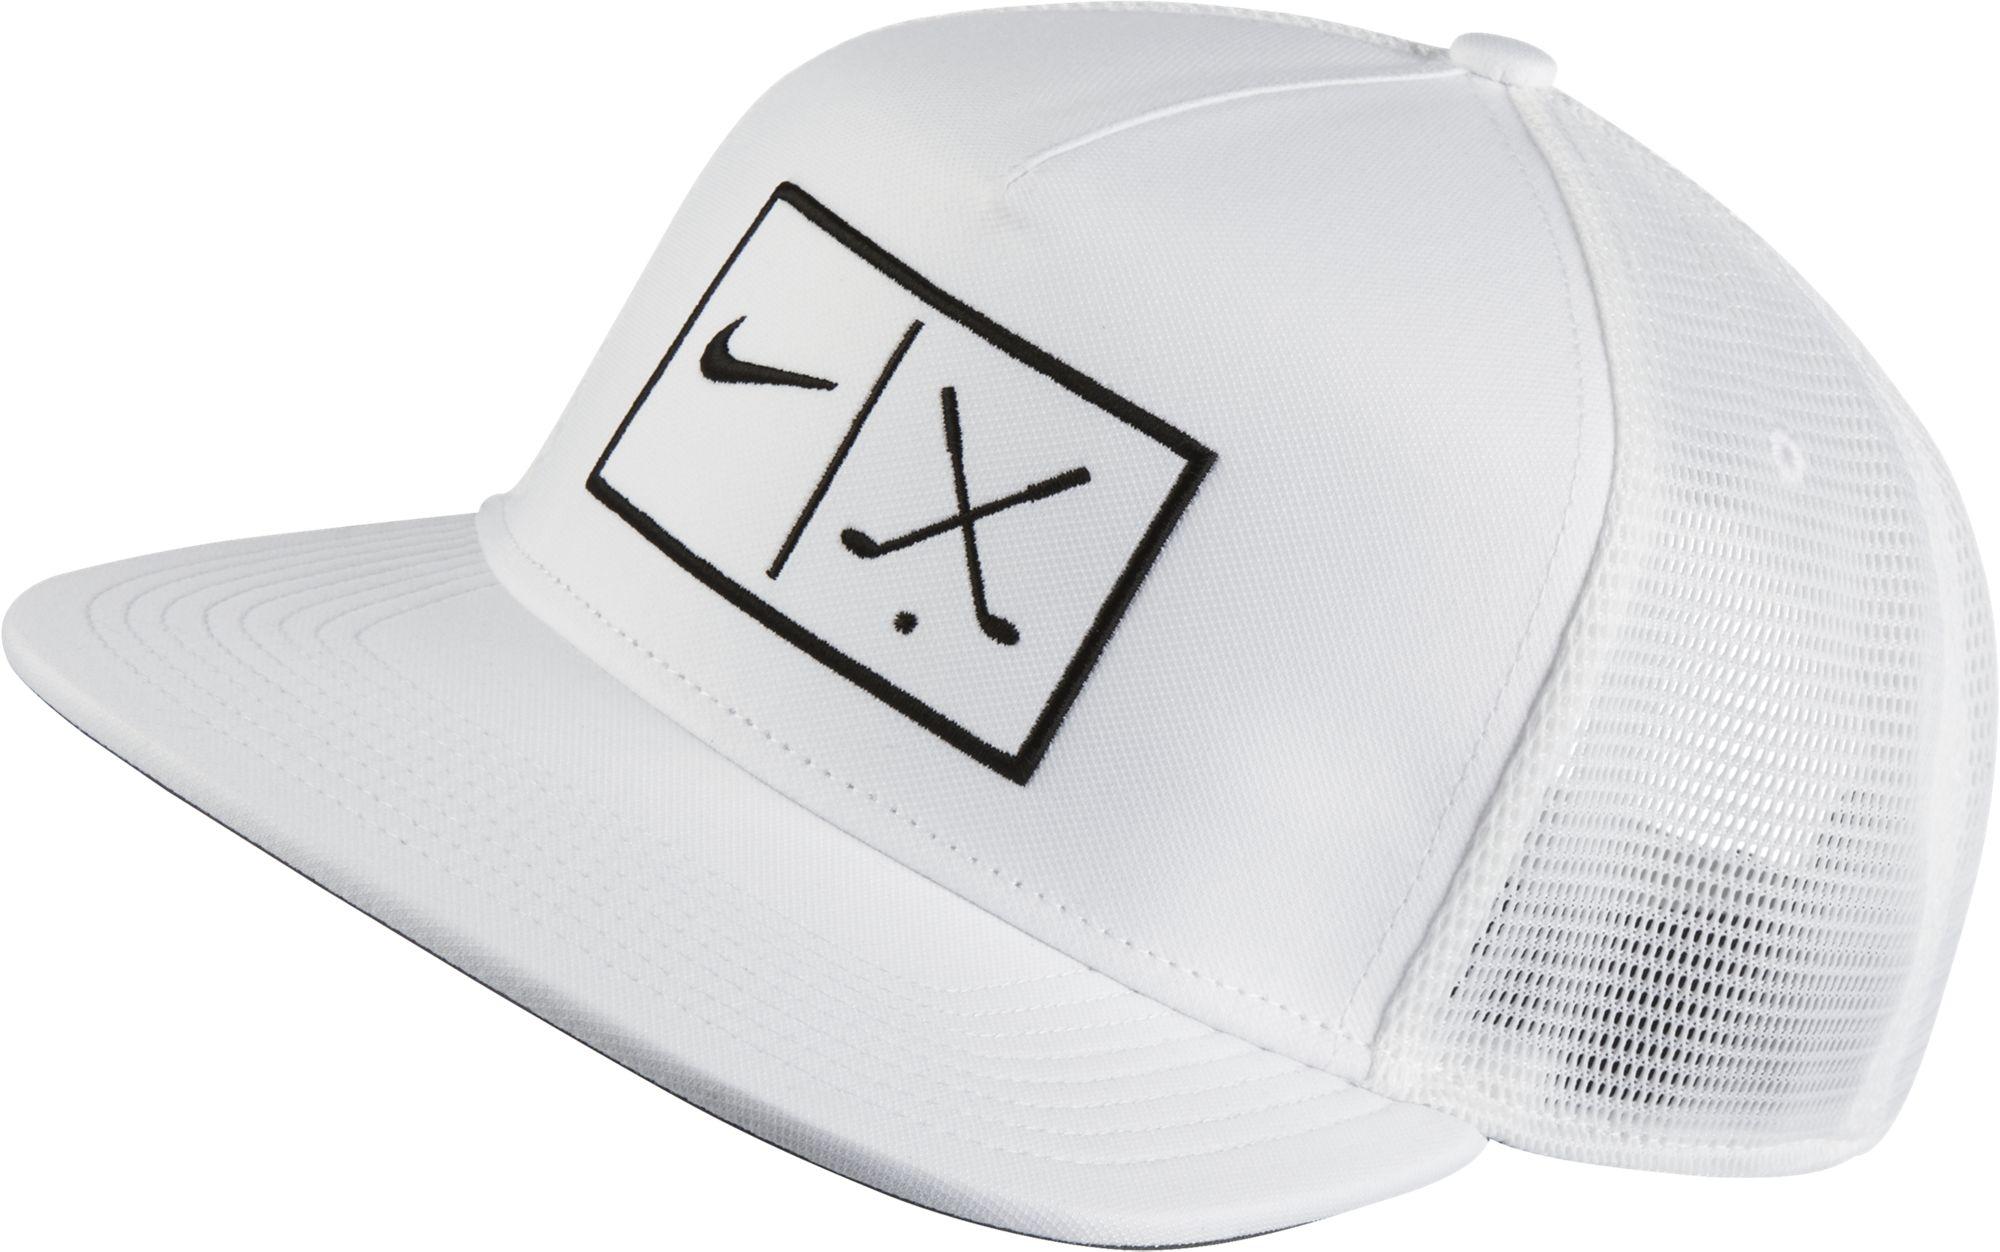 Nike-Golf-2017-Pro-Mesh-Adjustable-Cap-Hat-